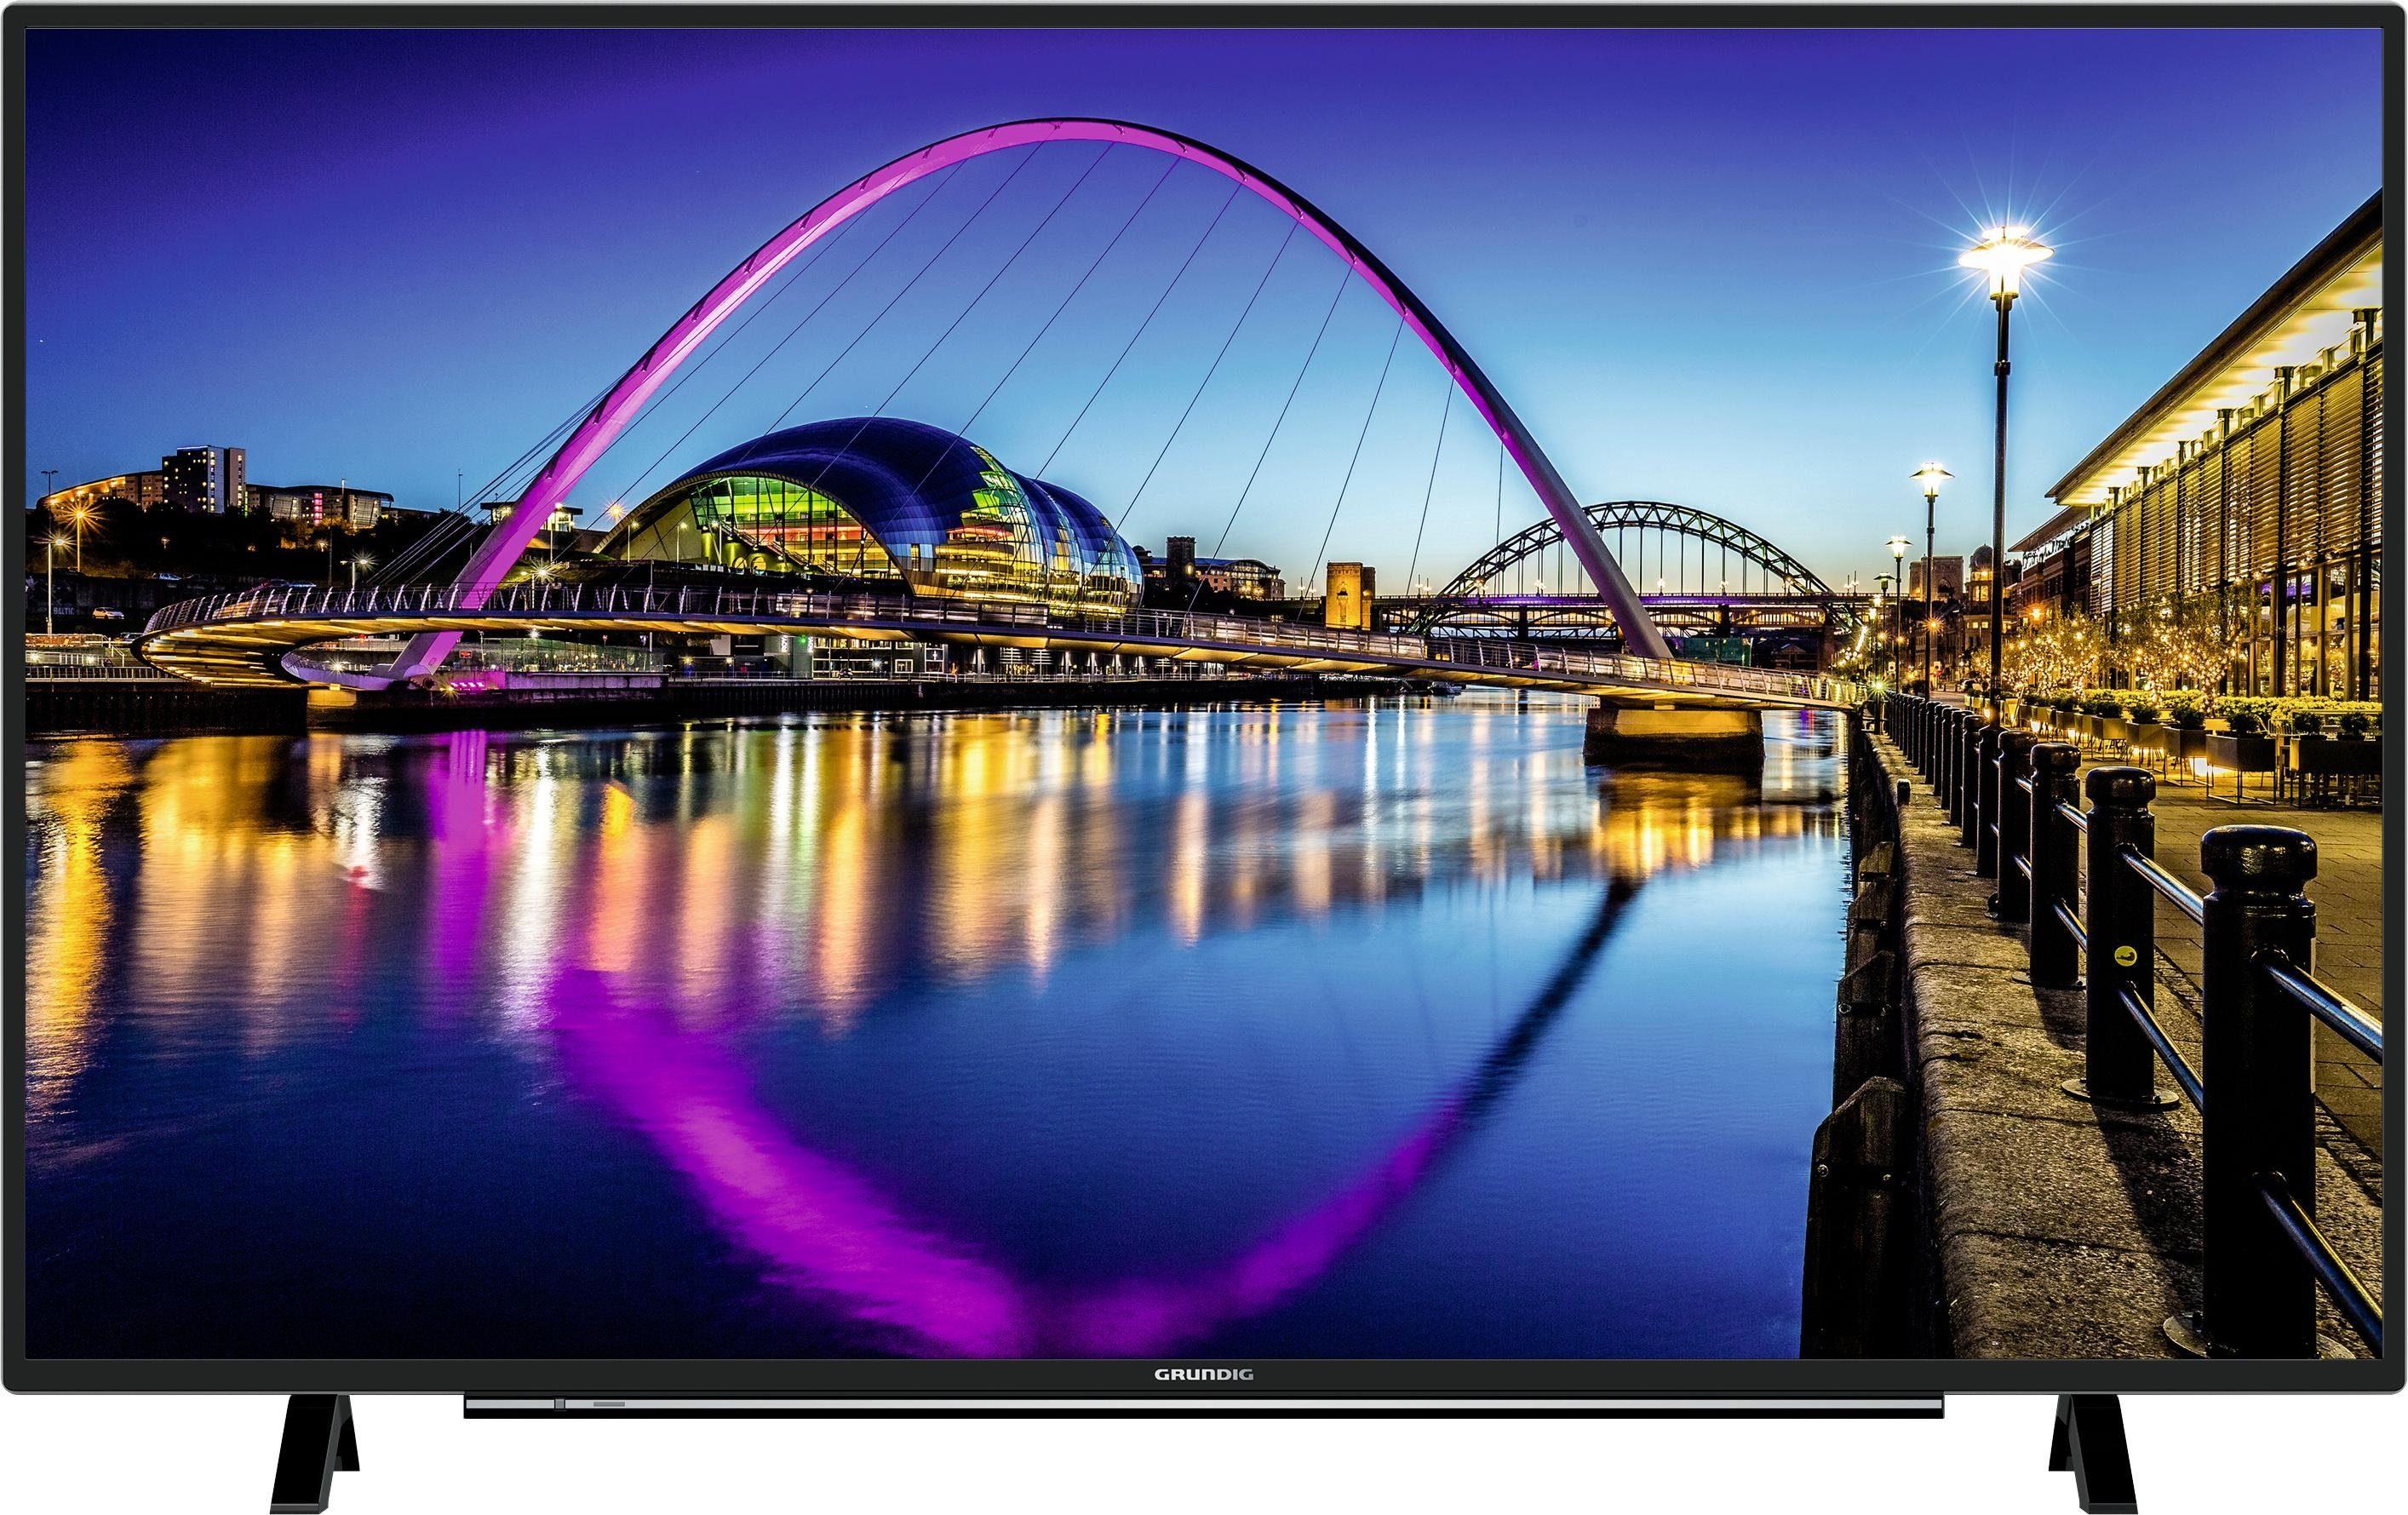 Grundig 40 GFB 6822 LED-Fernseher (102 cm/40 Zoll, Full HD, Smart-TV)